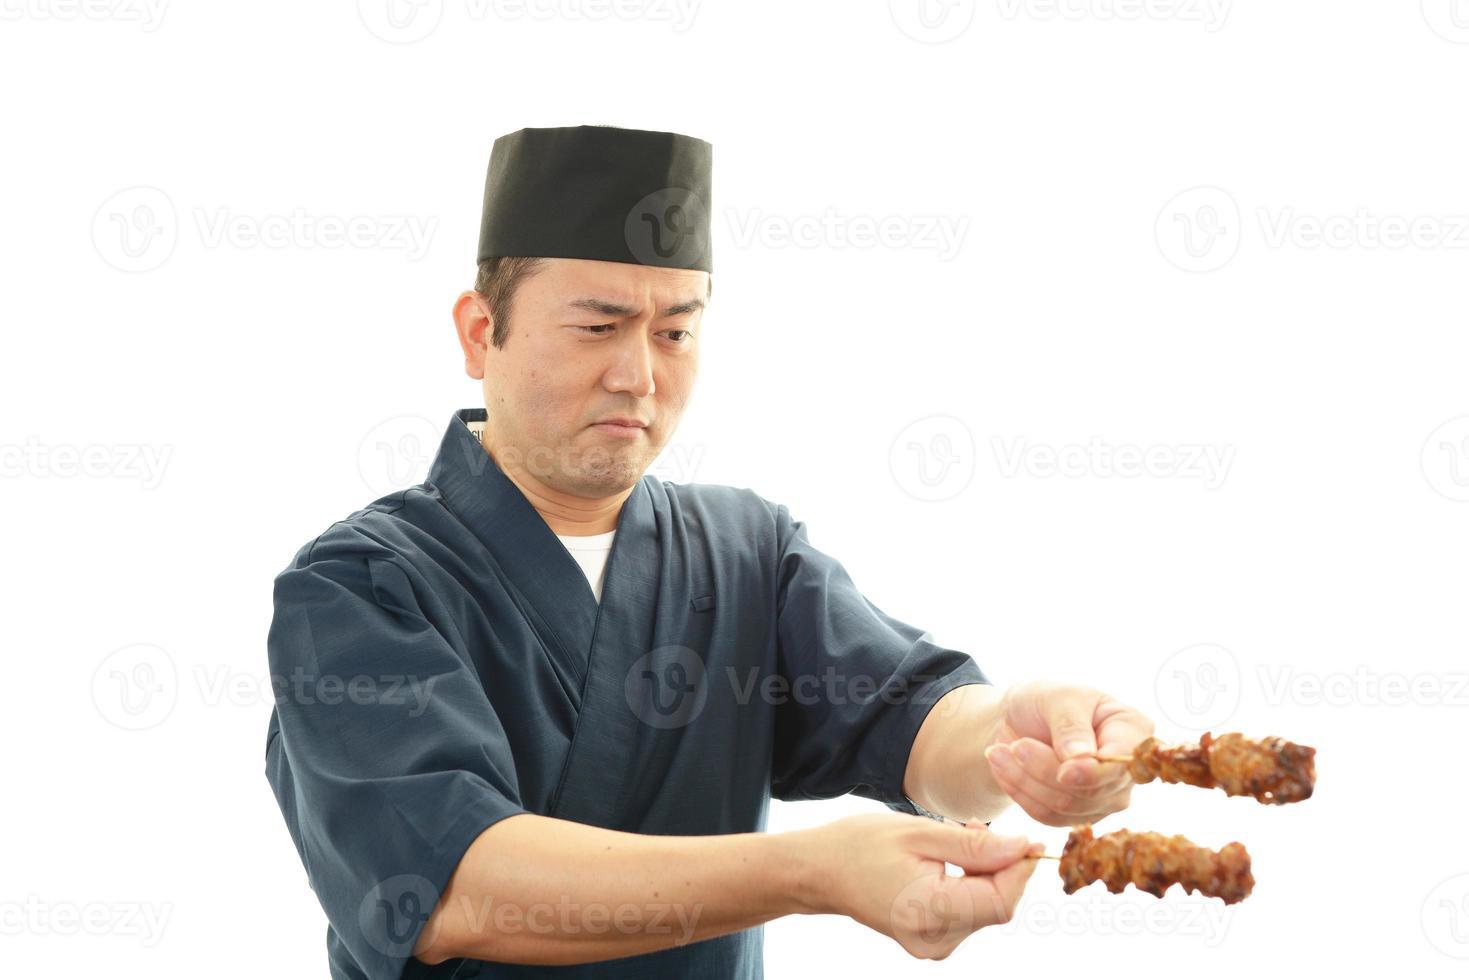 arbetar asiatisk kock foto